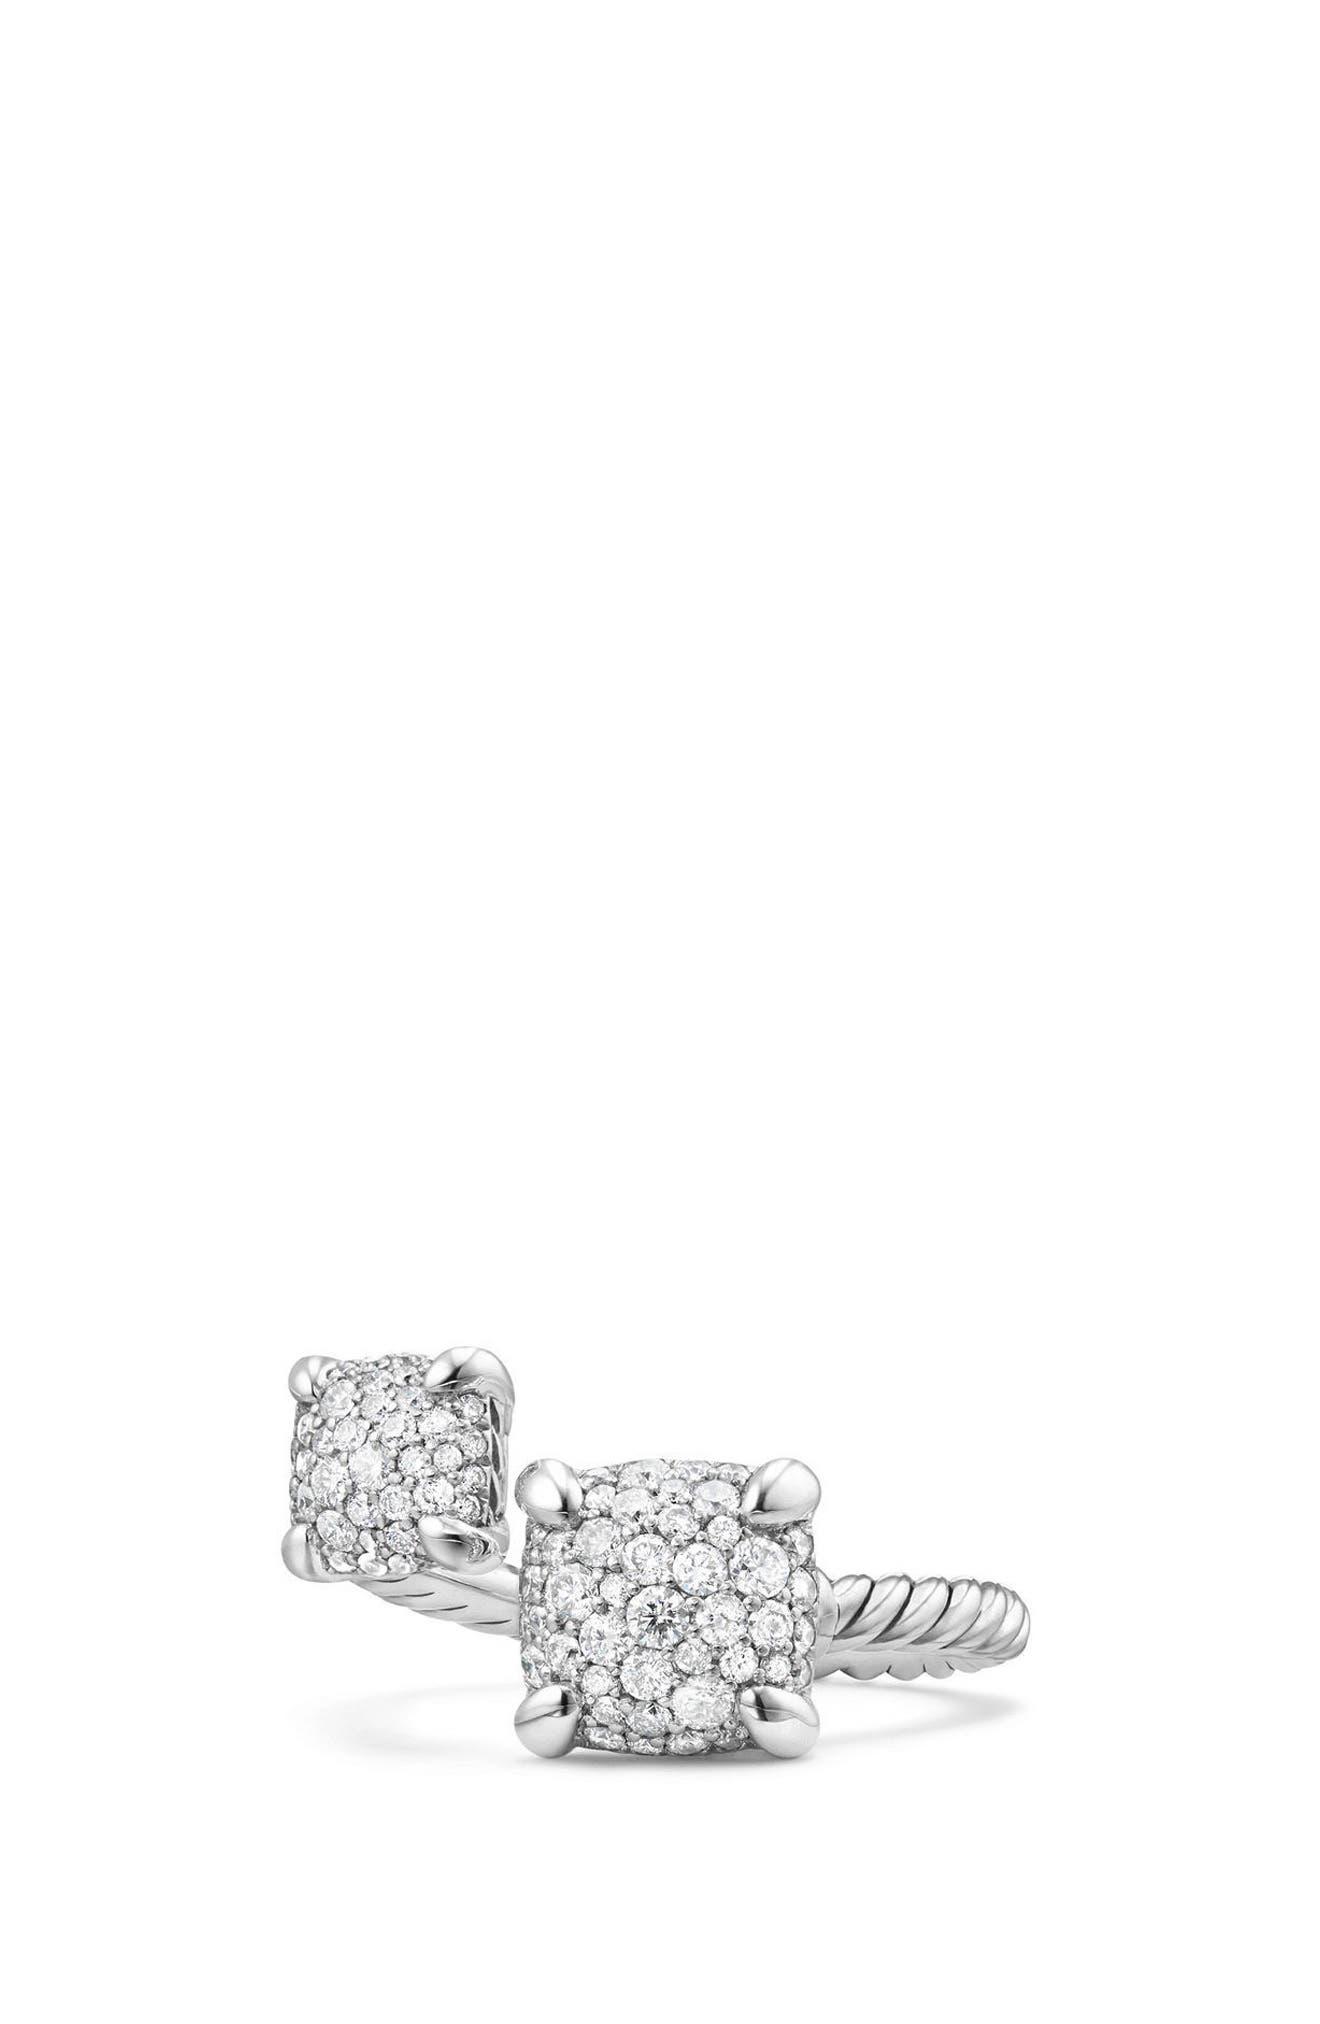 David Yurman Chatelaine Bypass Ring with Diamonds